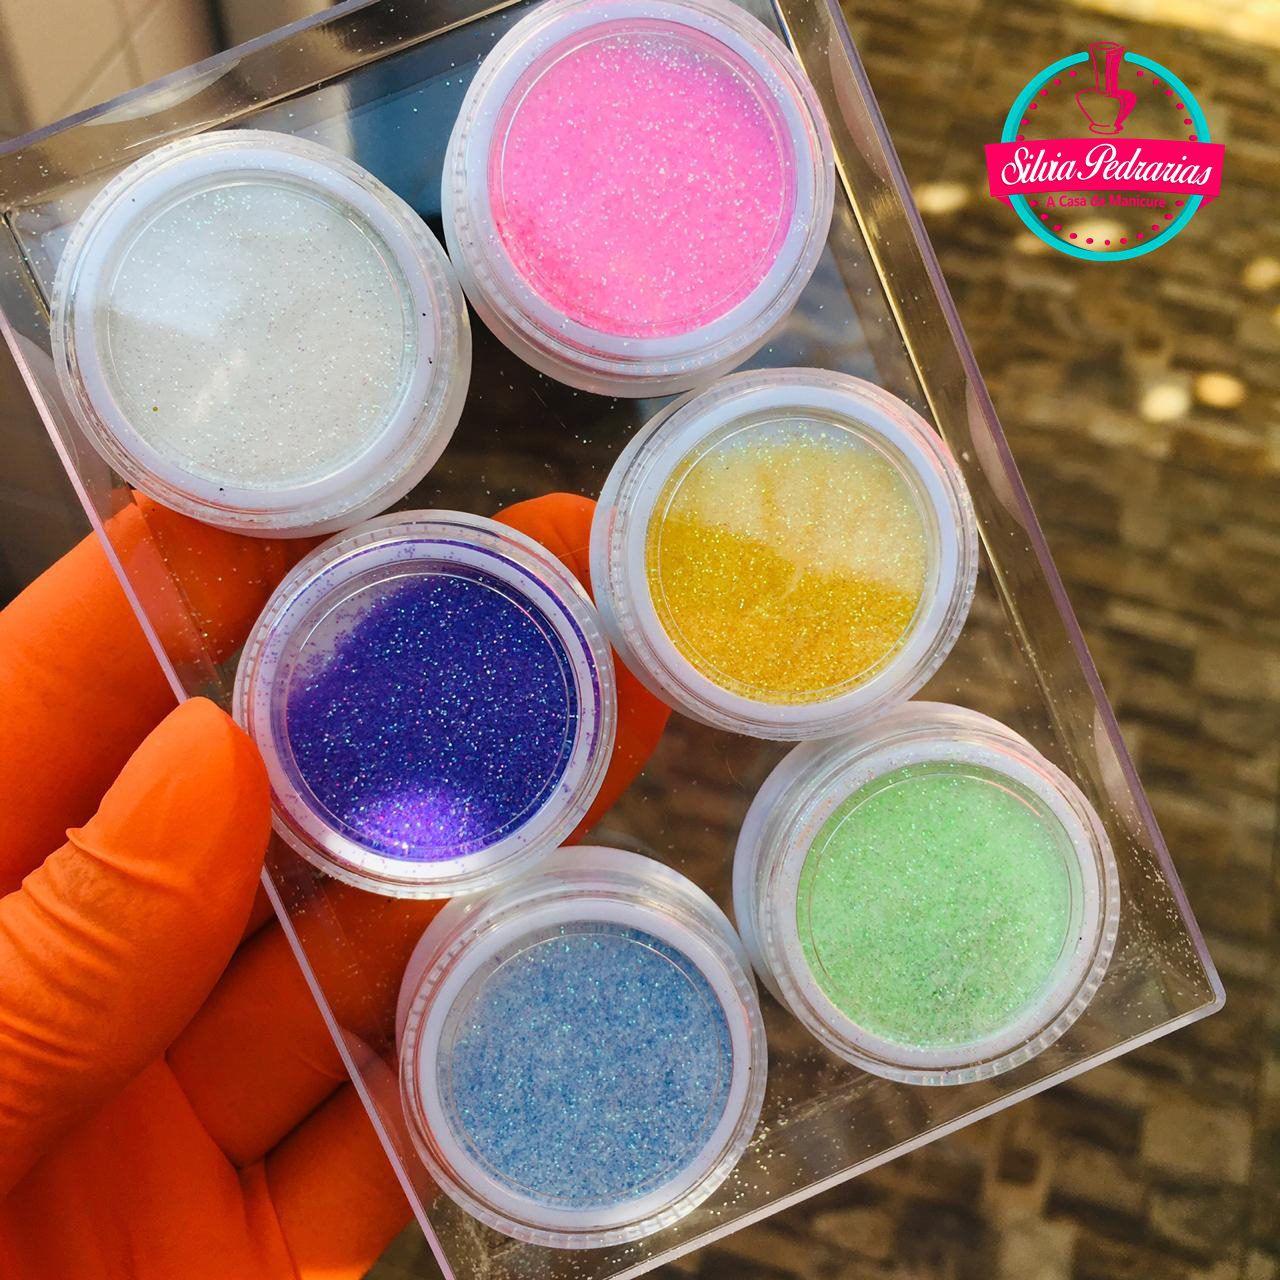 Kit com 06 glitter ultrafino Helen color tons claros (ref01)  - Sílvia Pedrarias & Cia